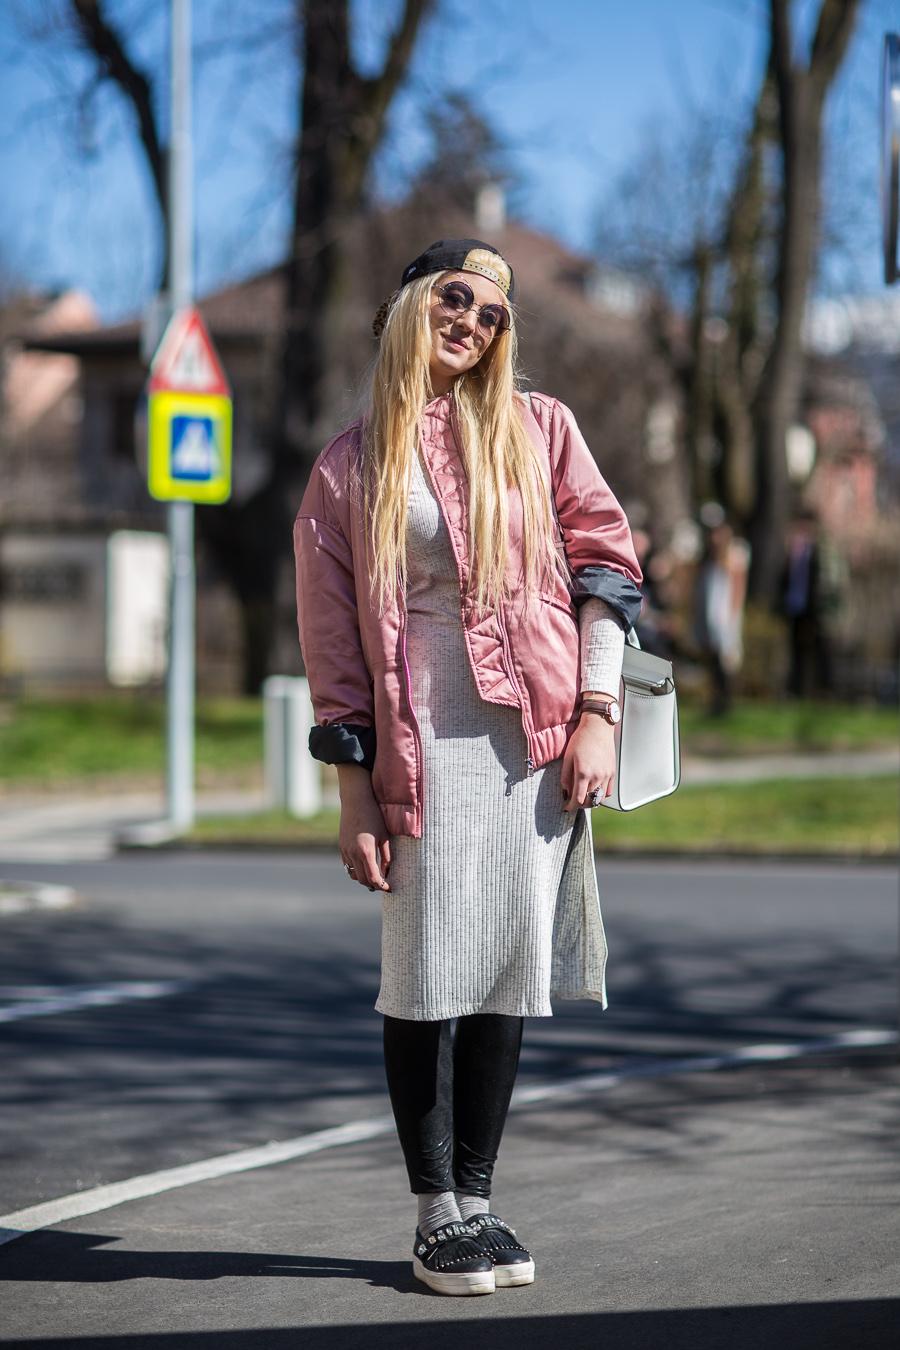 street-style-fashion-blog-innsbruck-vintage-markt-4.jpg